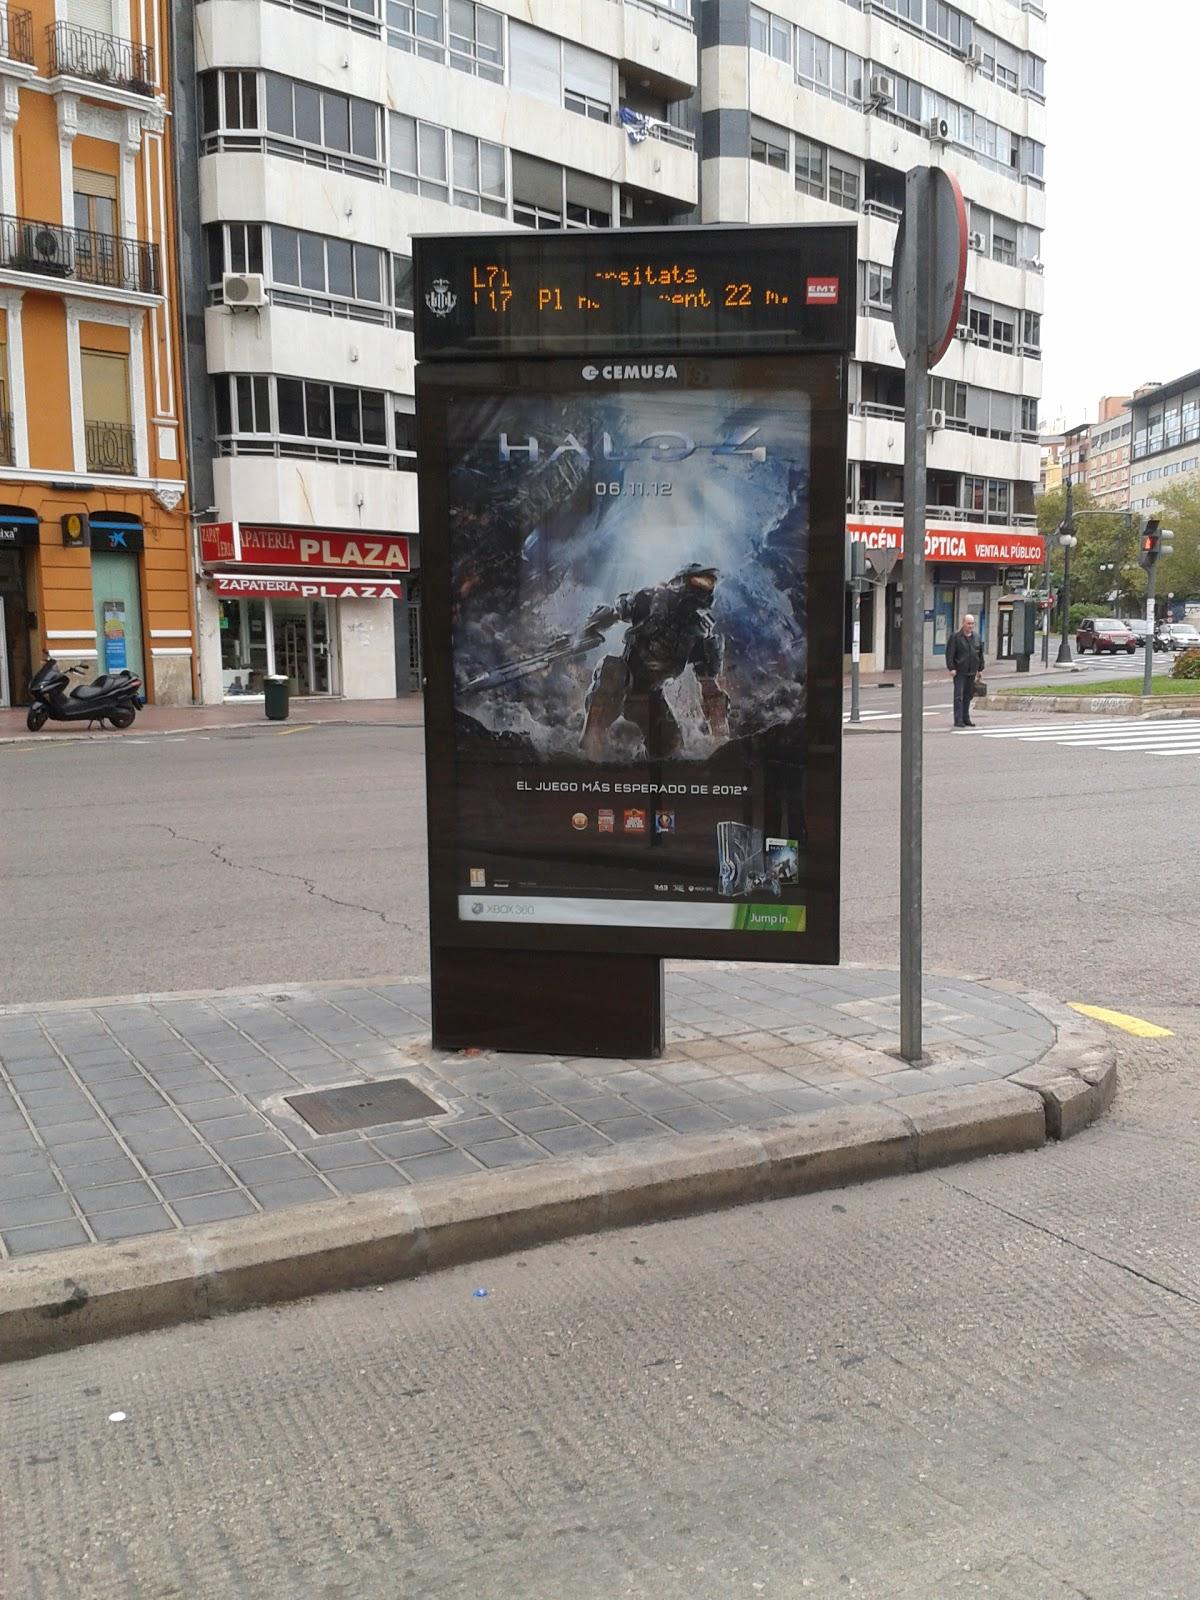 Cartel Halo 4 en Plaza de España